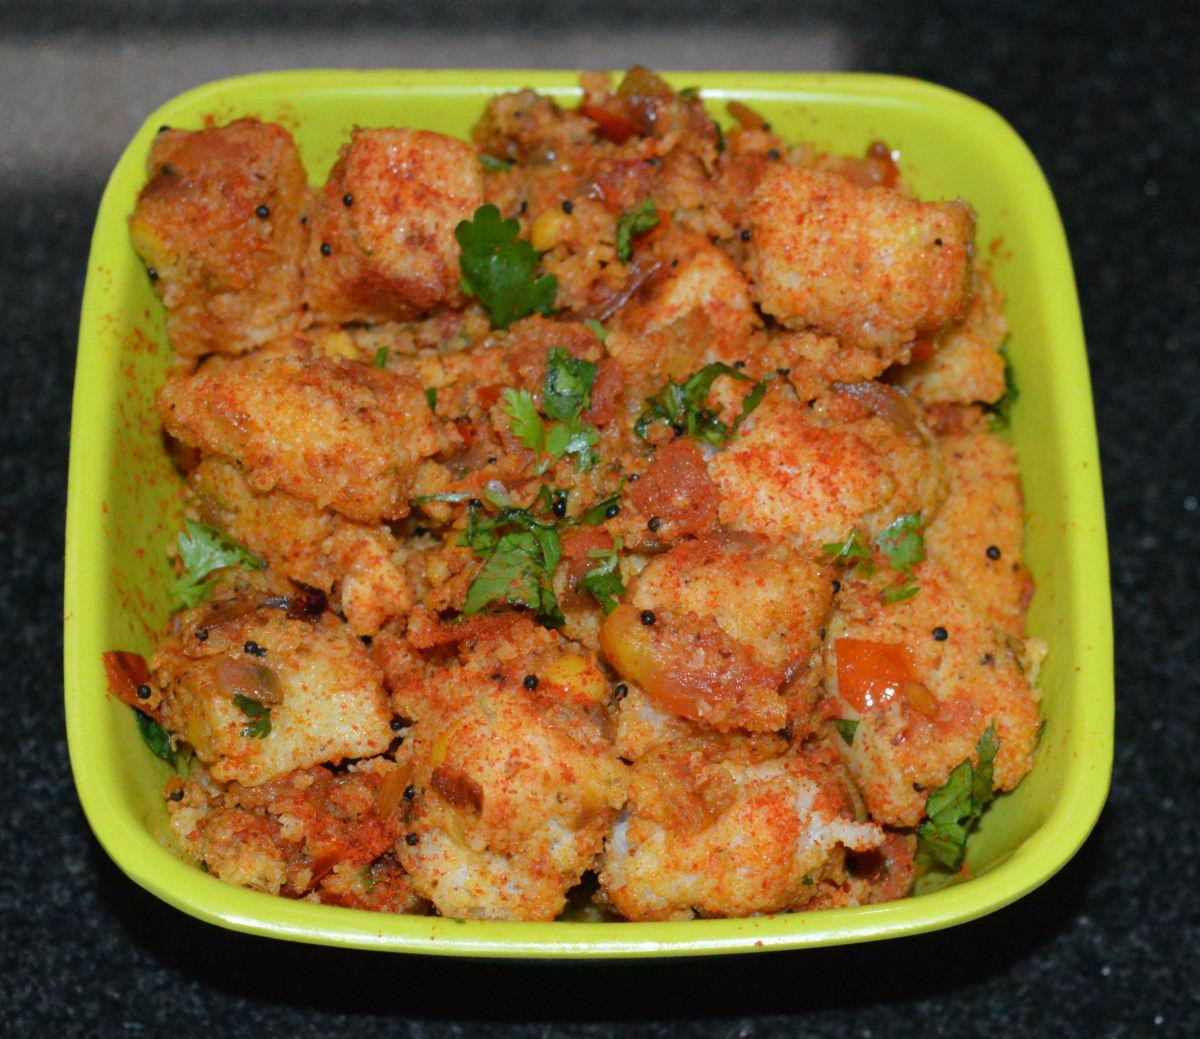 How to Make Spicy Tava Idli/Idli Recipes